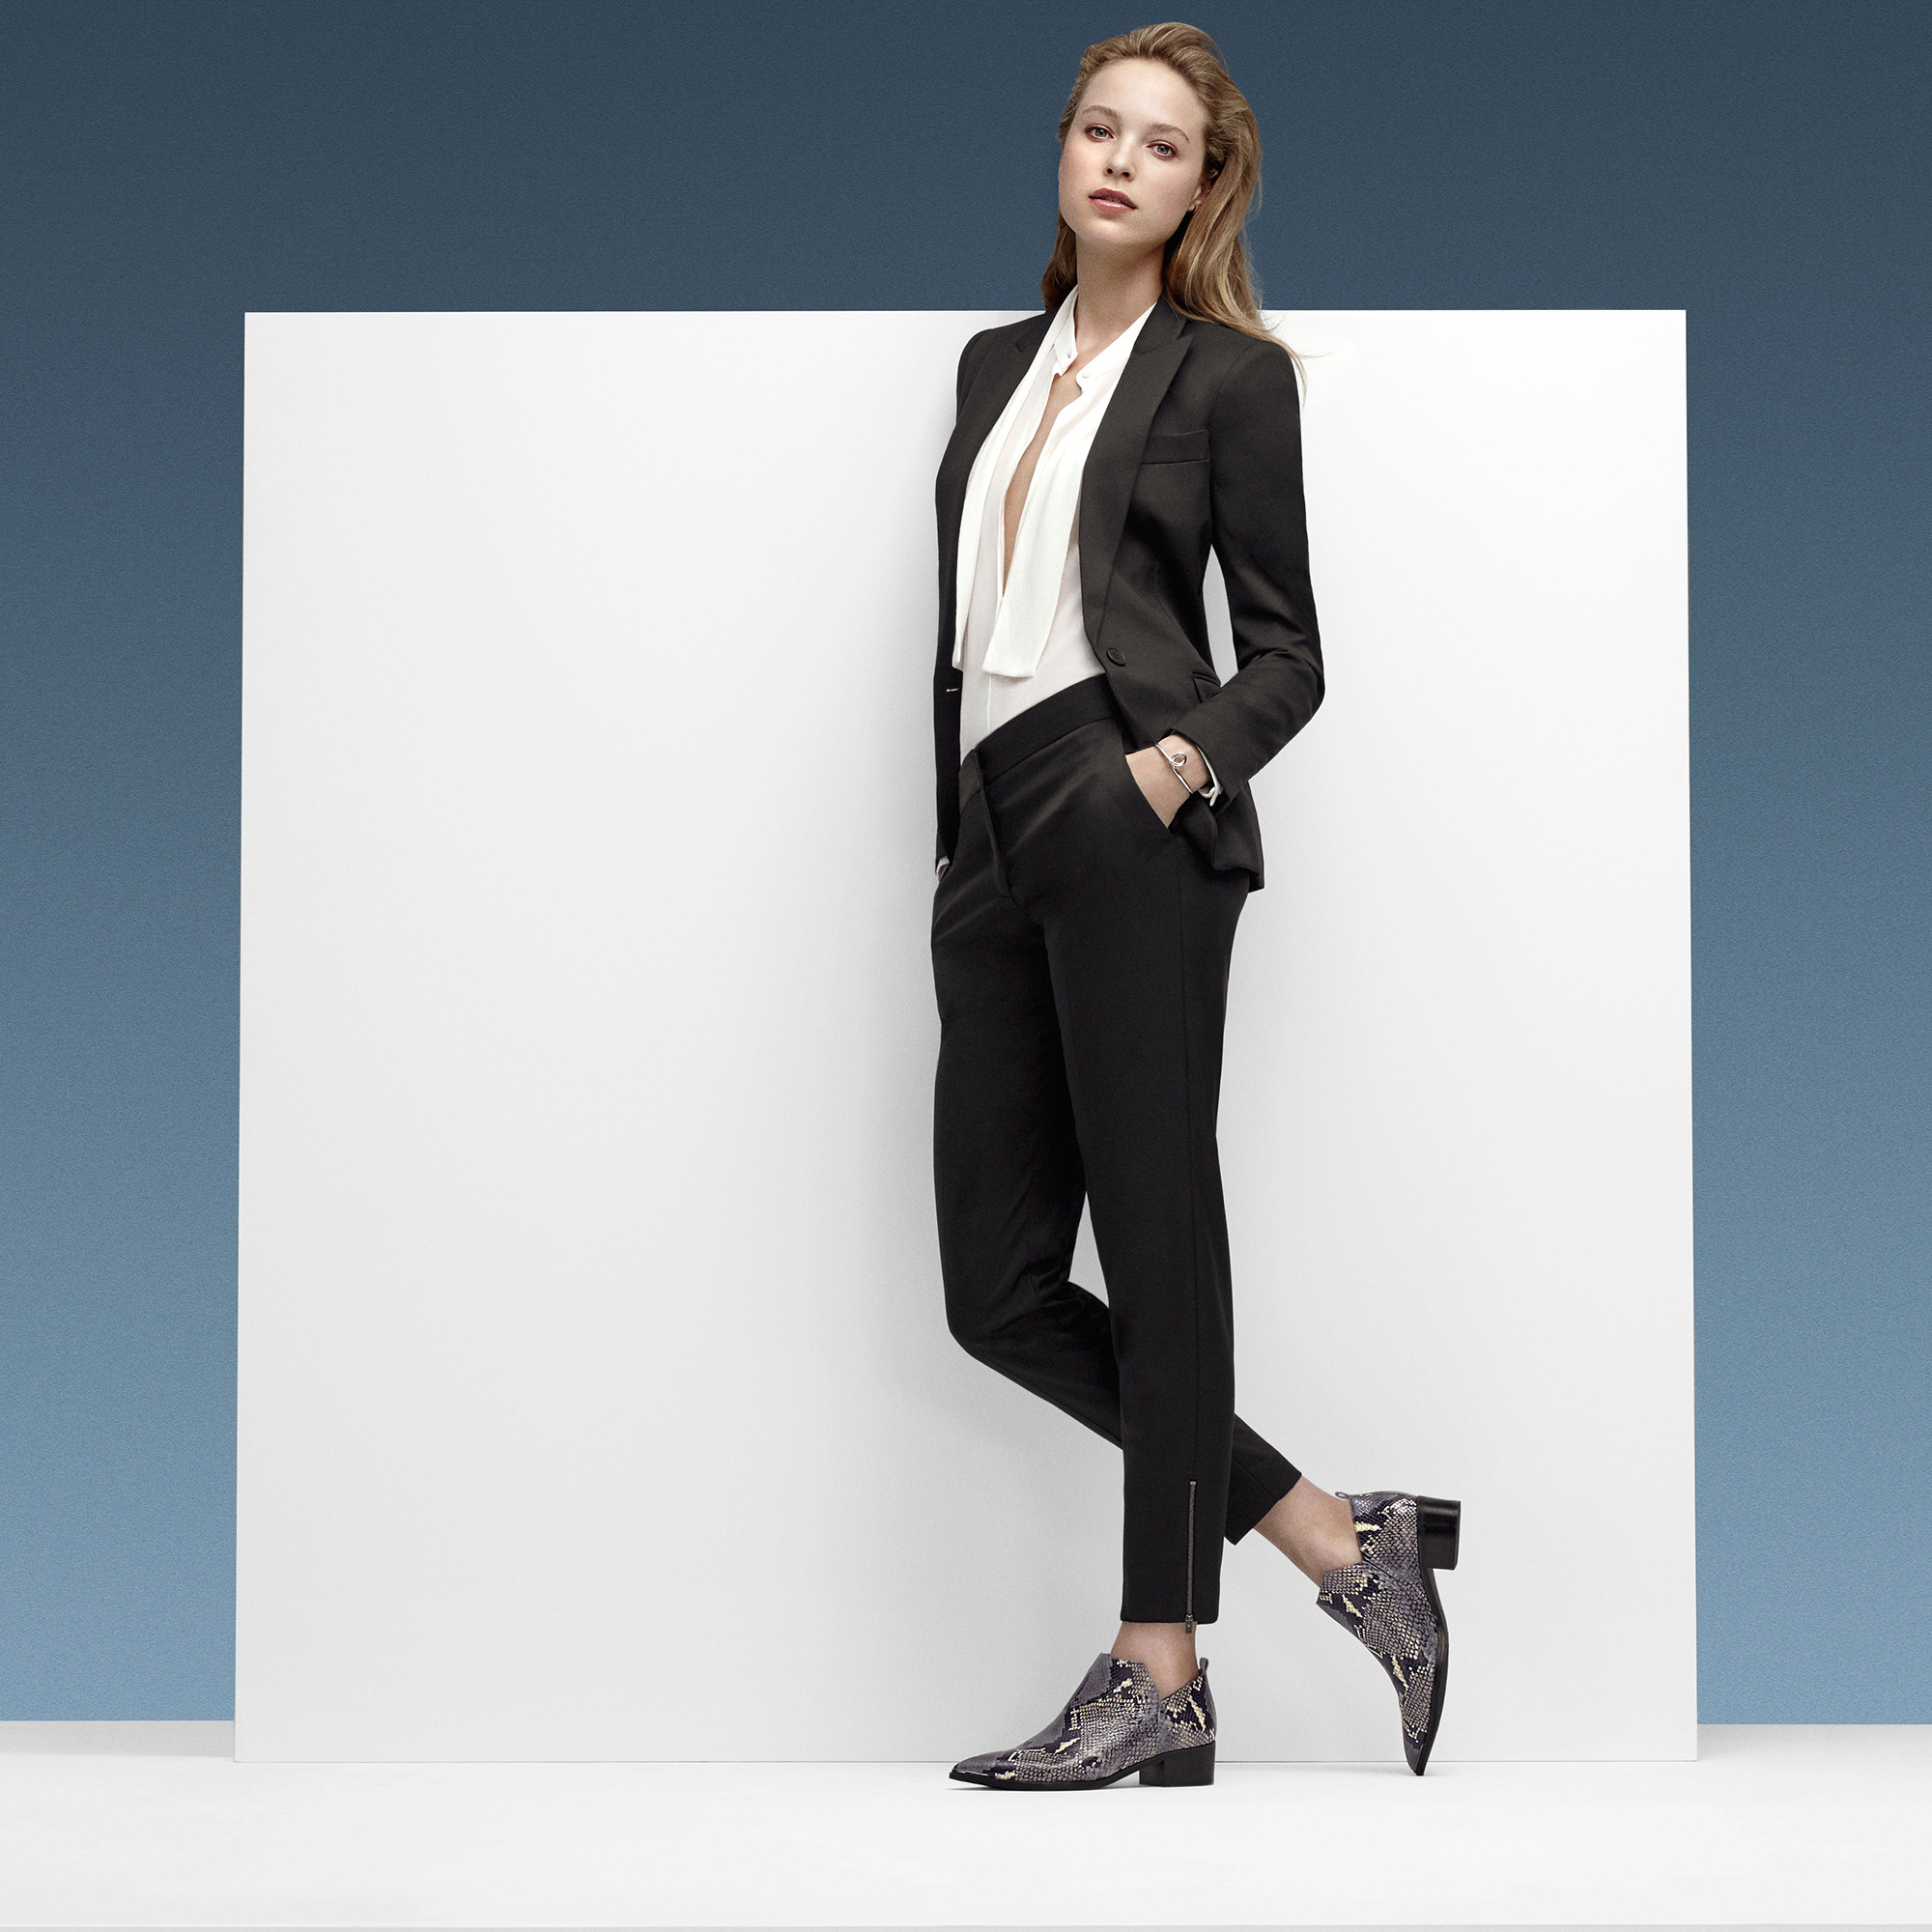 Designer Boots |Marc Fisher Footwear